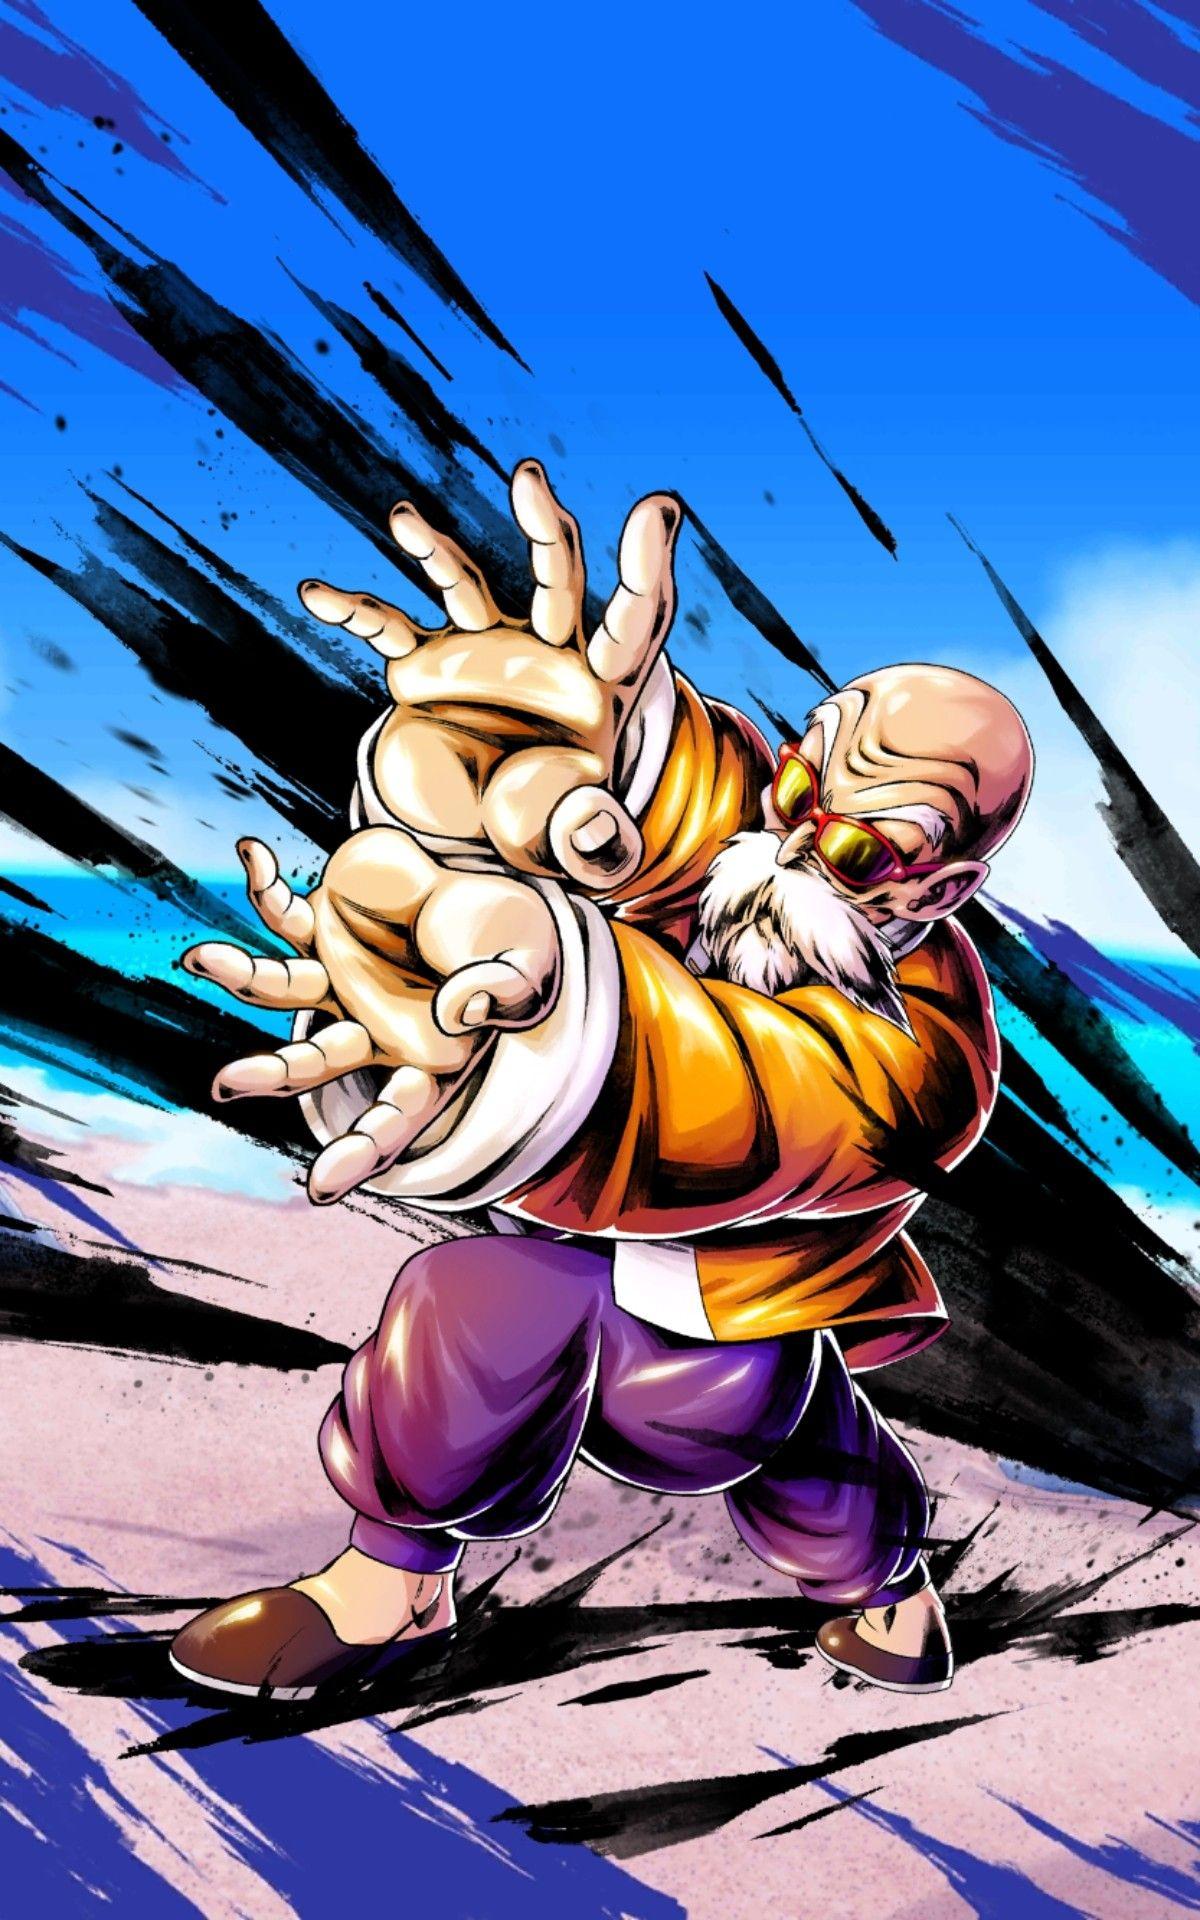 Master Roshi Anime Dragon Ball Super Dragon Ball Super Goku Dragon Ball Goku